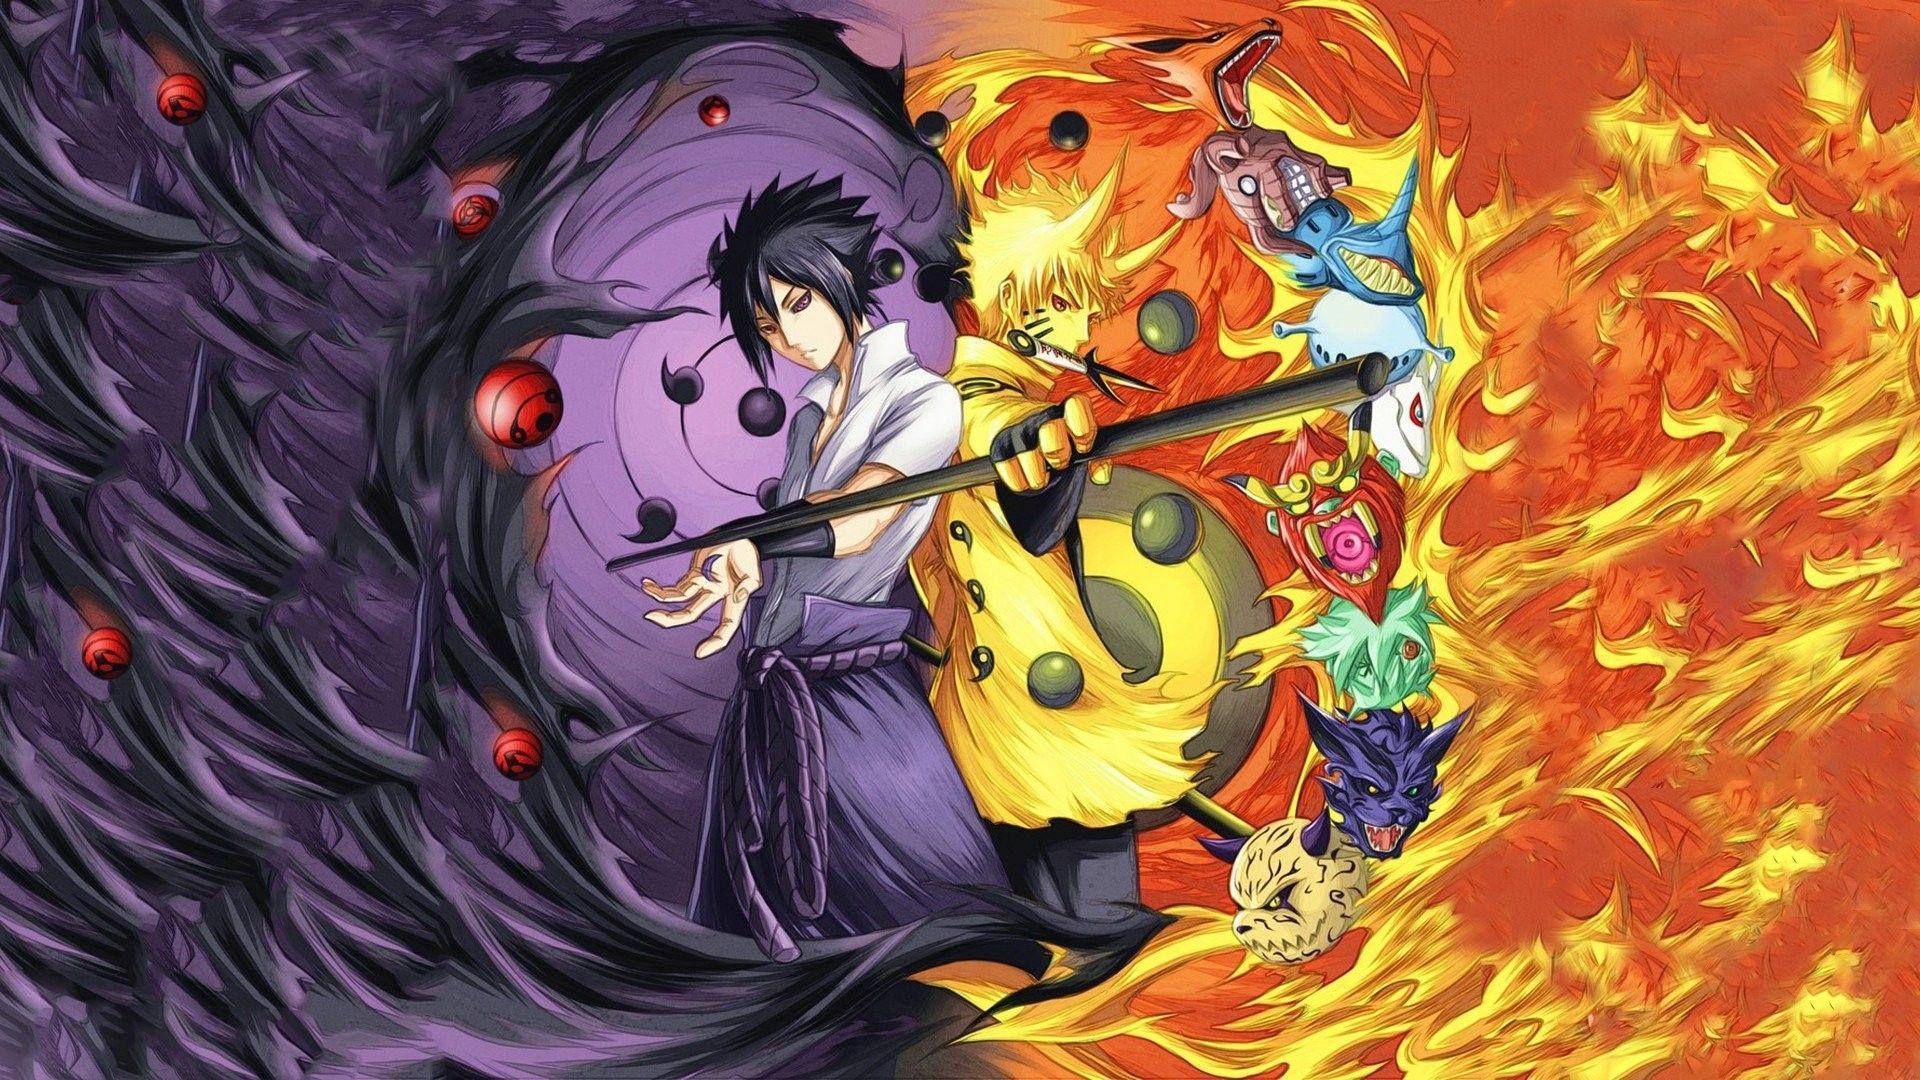 Download 4800 Naruto Wallpaper Galaxy S8 Gambar HD Paling Keren